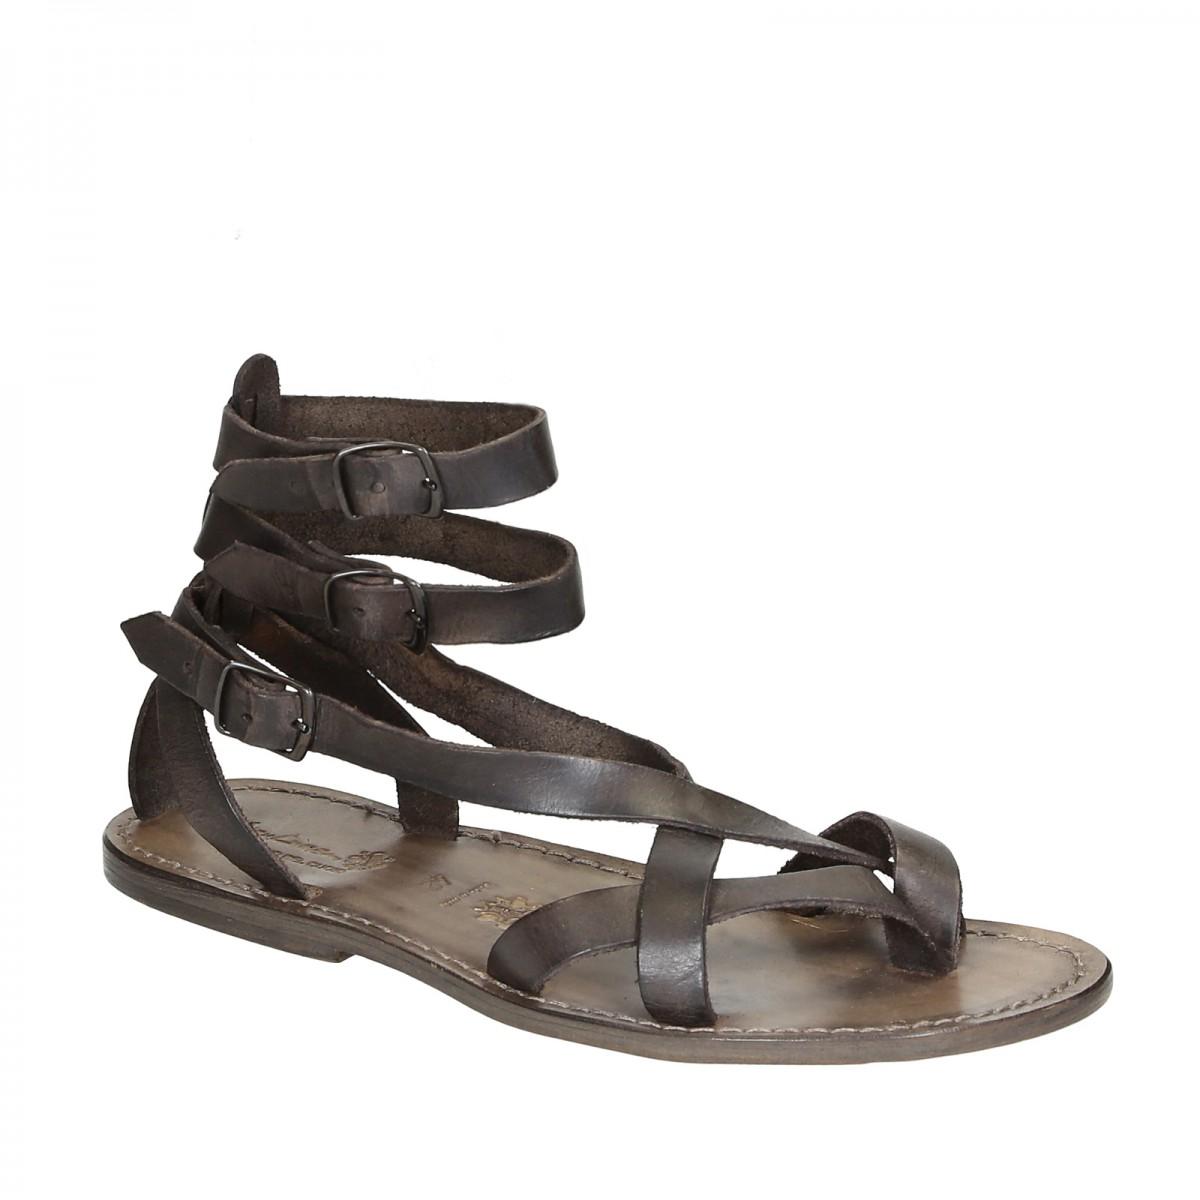 1e053801b8c Men s mud color gladiator sandals Handmade in Italy. Loading zoom